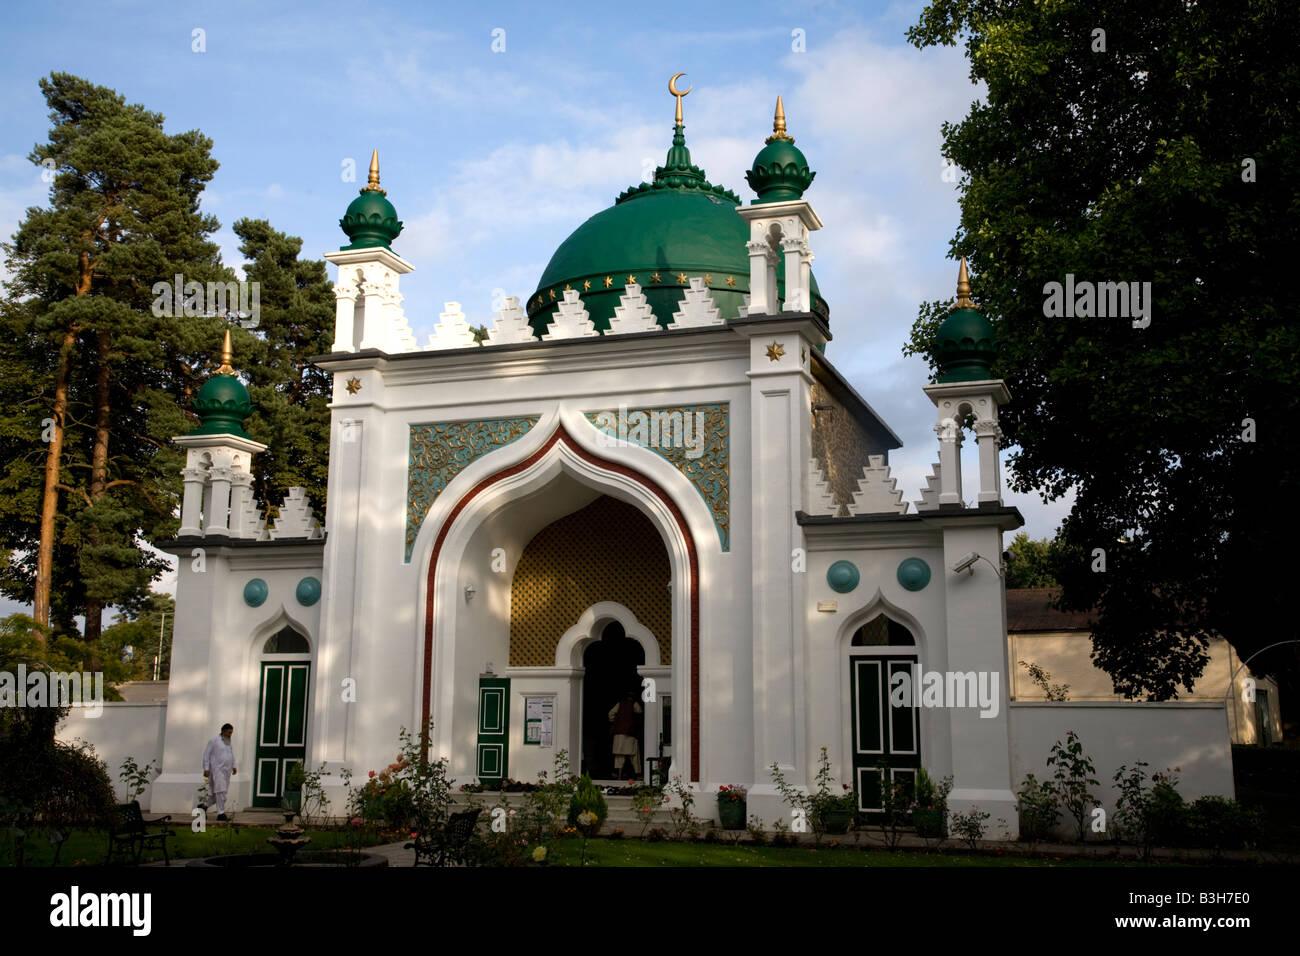 Shah Jahan Mosque Woking Surrey England Stock Photo